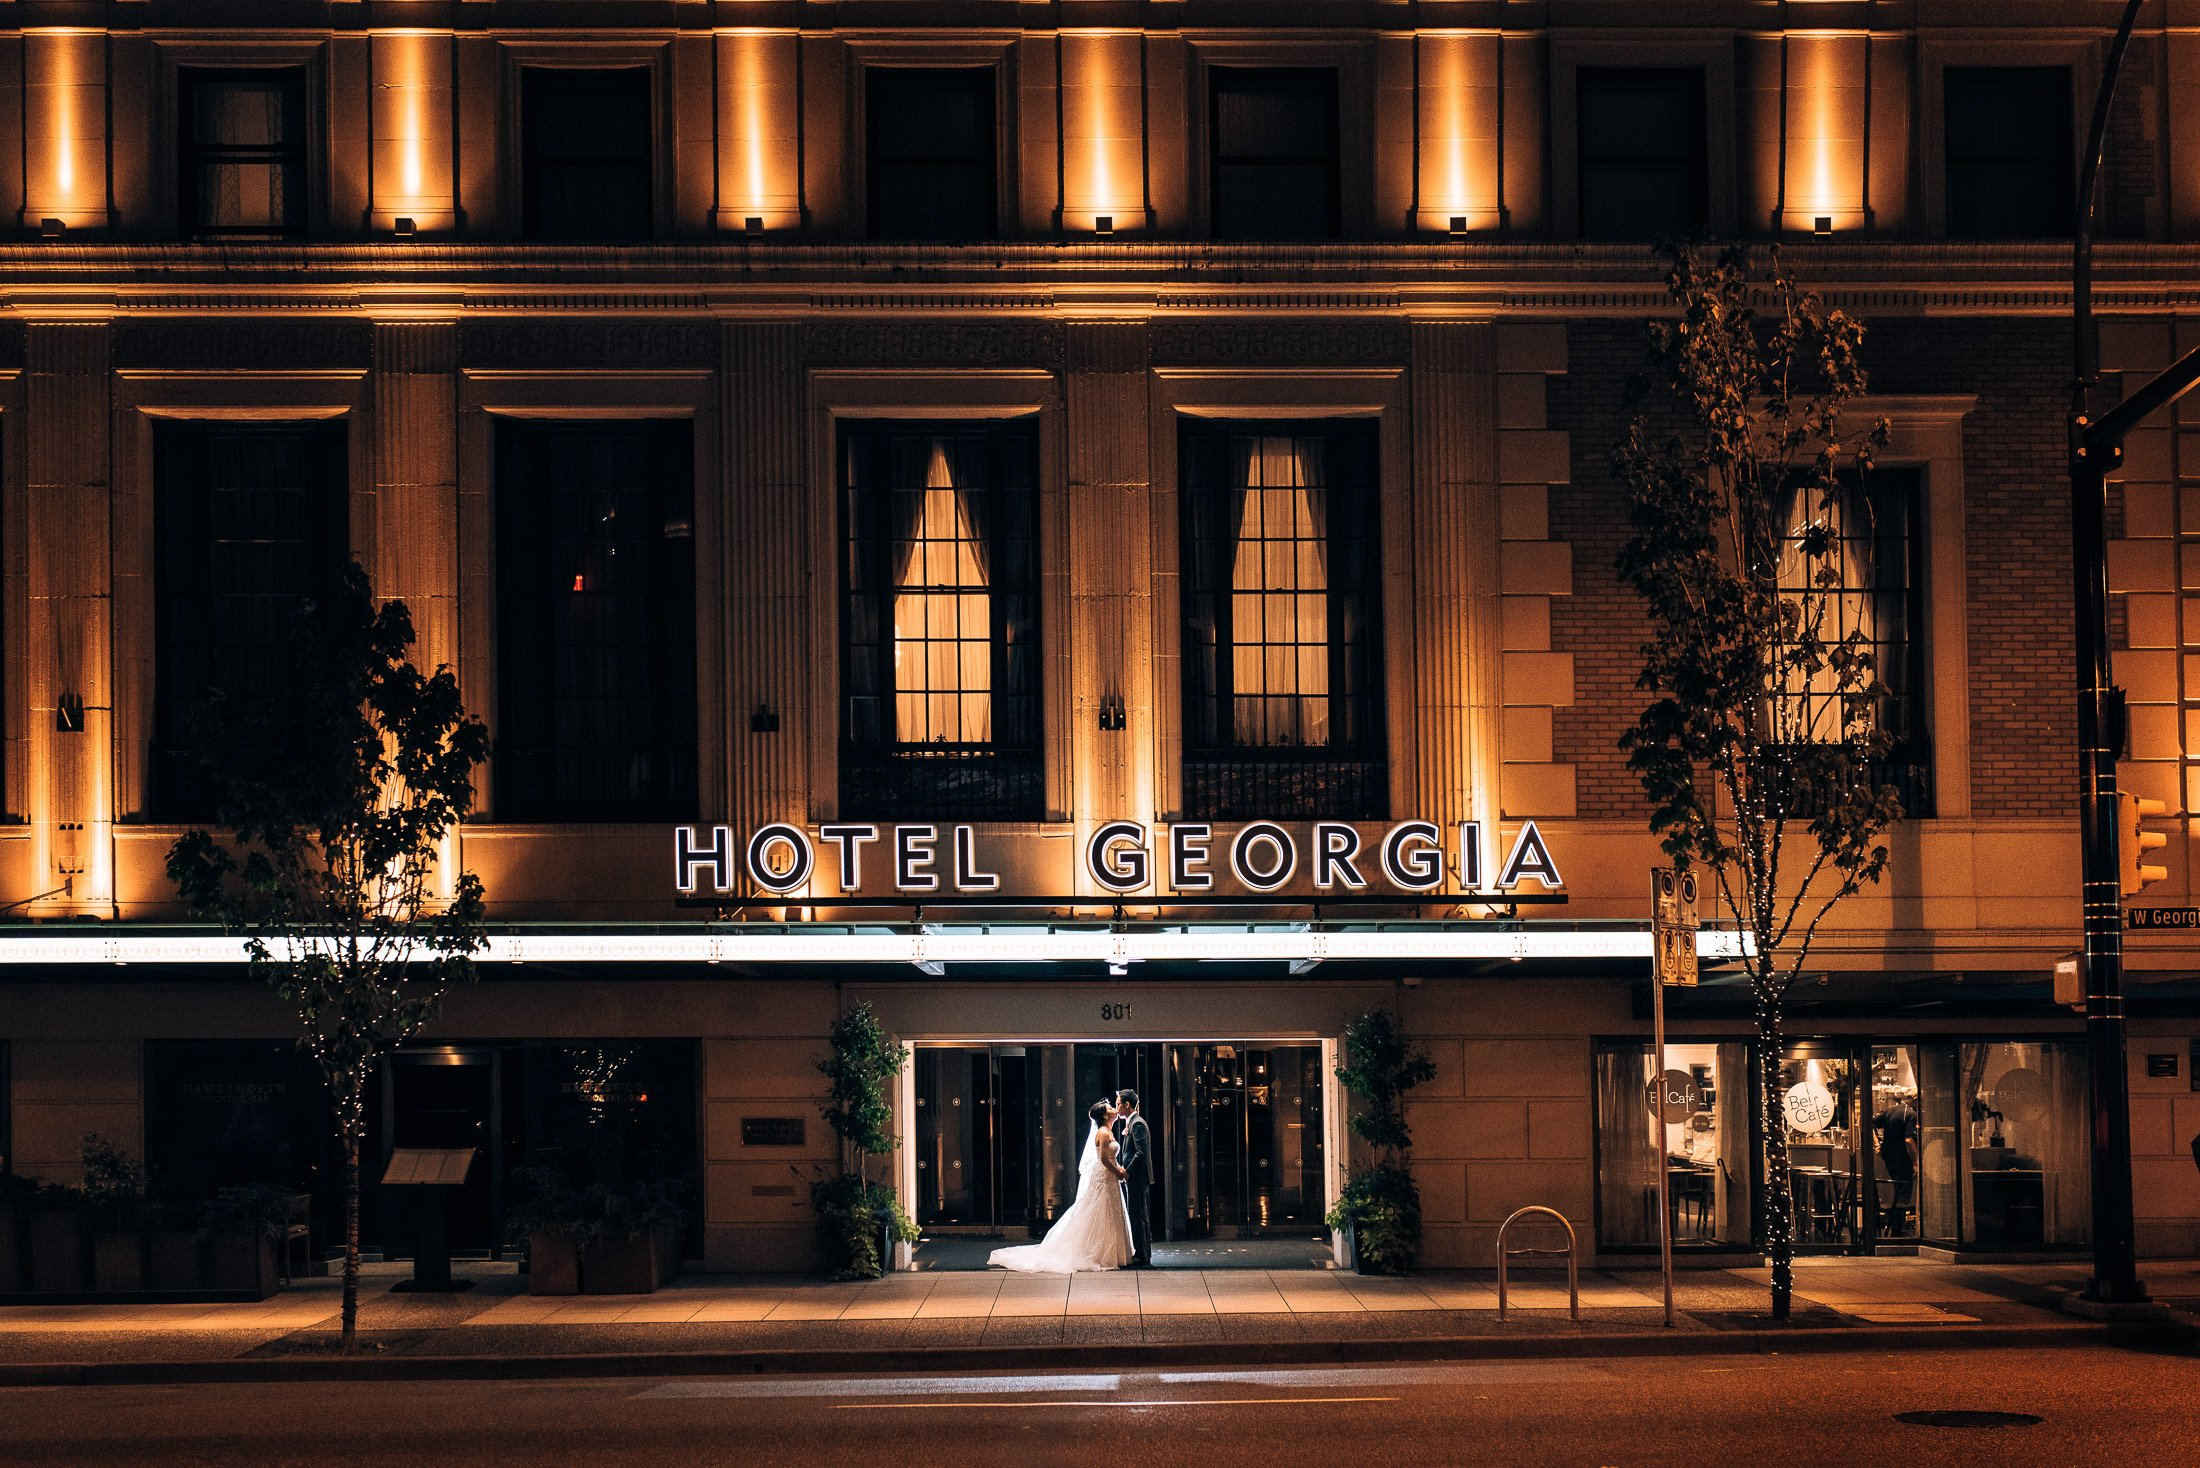 019 night photo Rosewood Hotel Georgia